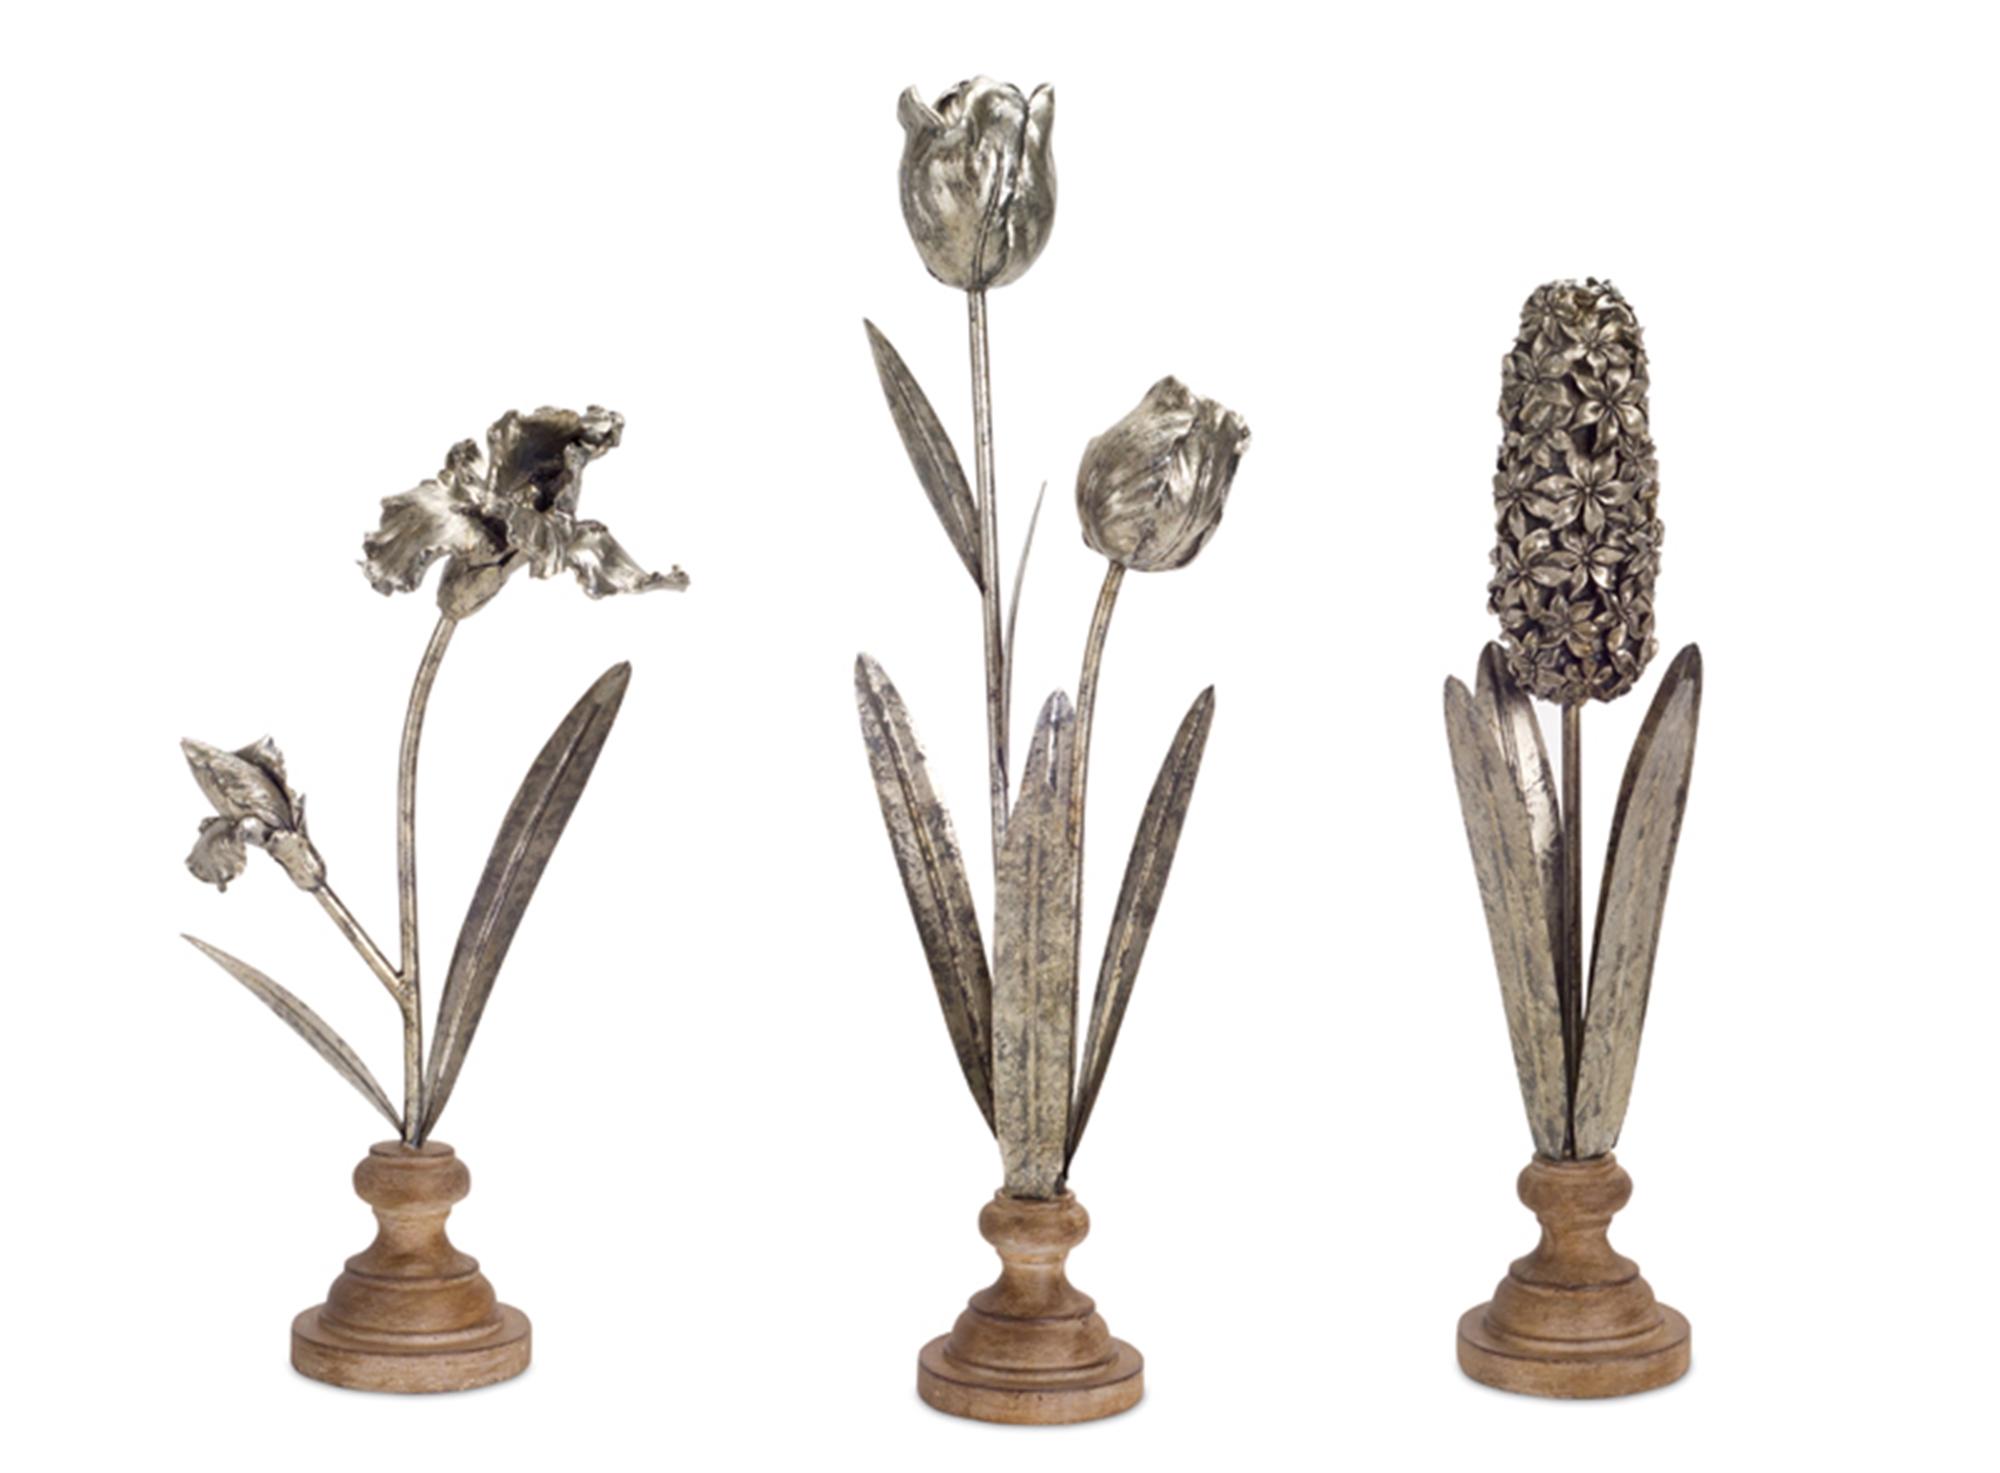 "Floral Decor (Set of 3) 15.5""H, 18""H, 22.5""H Resin/Metal"